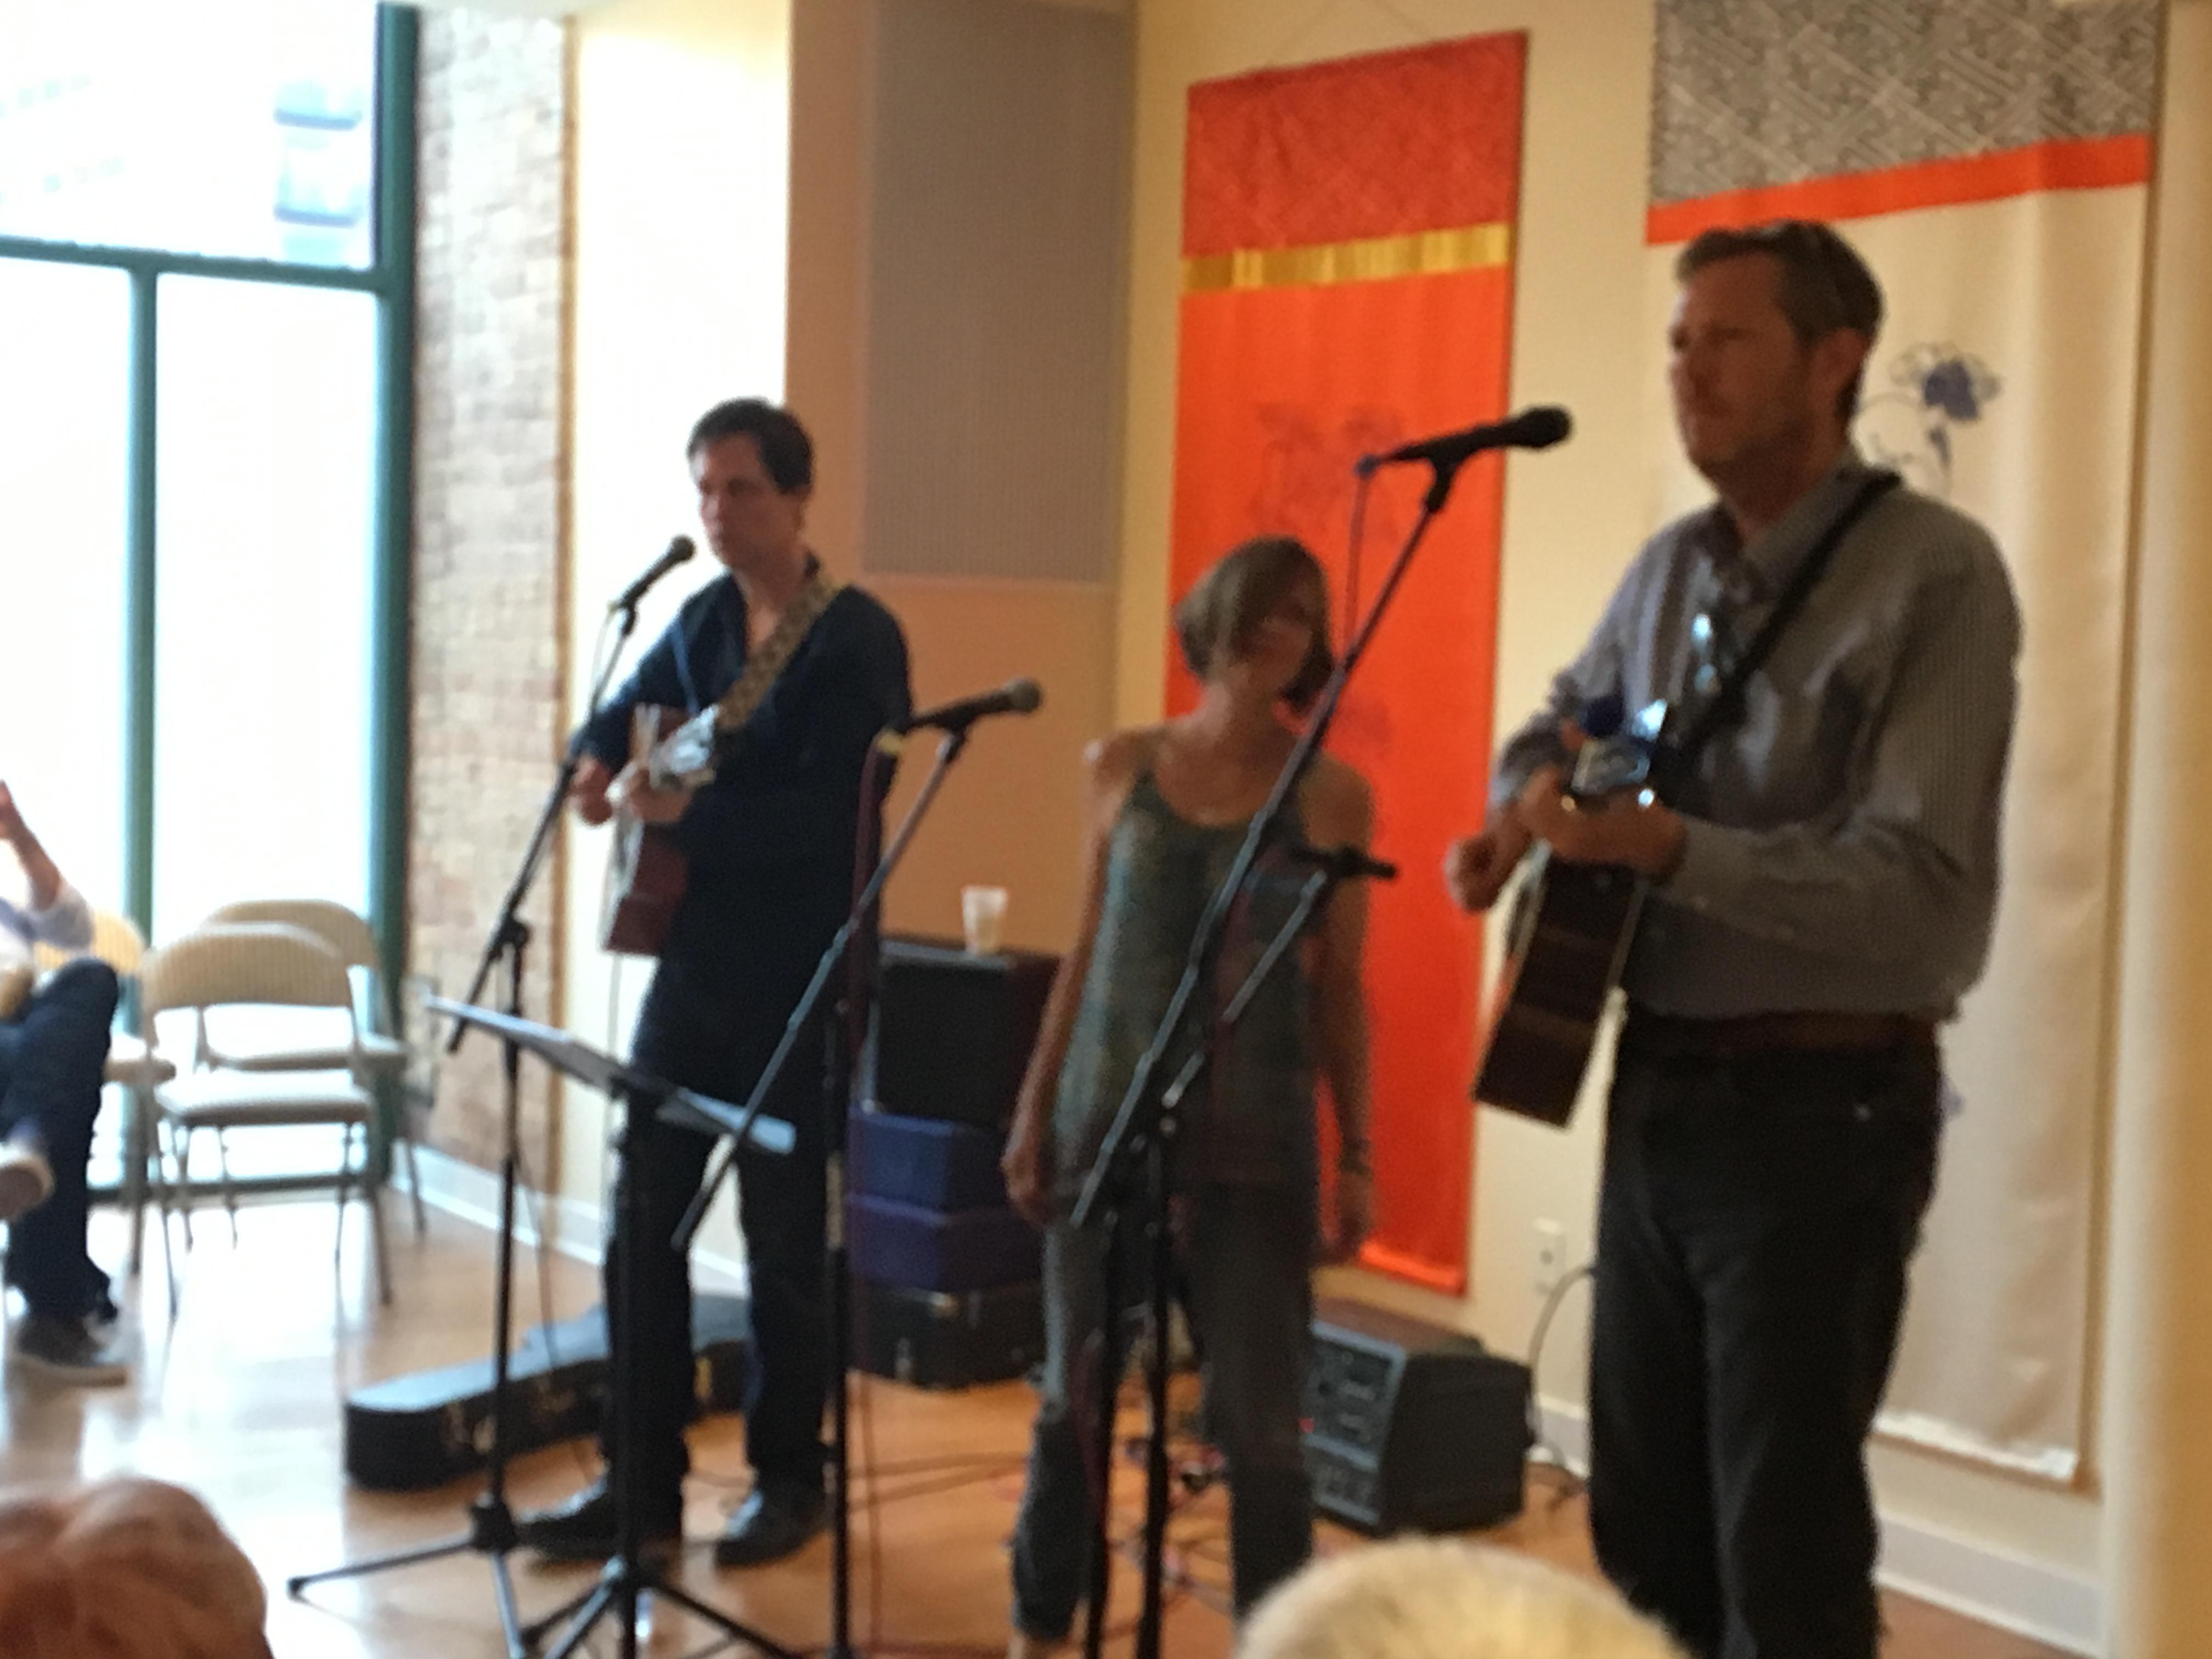 folk concert at shambhala chicago center